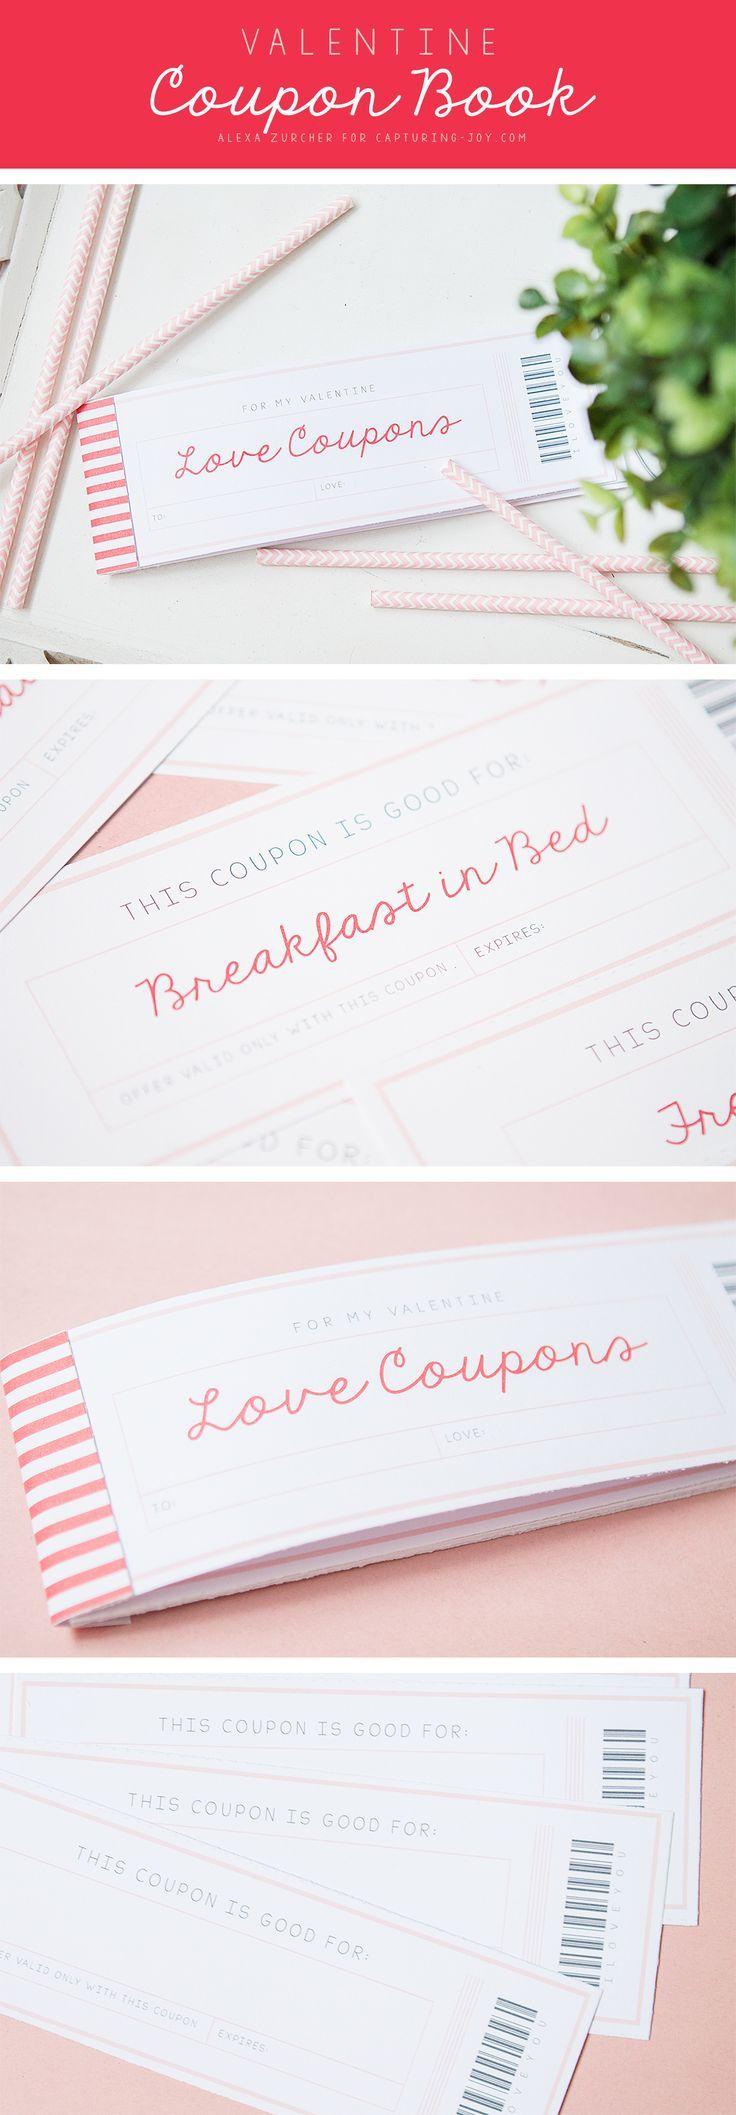 Valentine Coupon Book Printable Free Printable CouponsFree